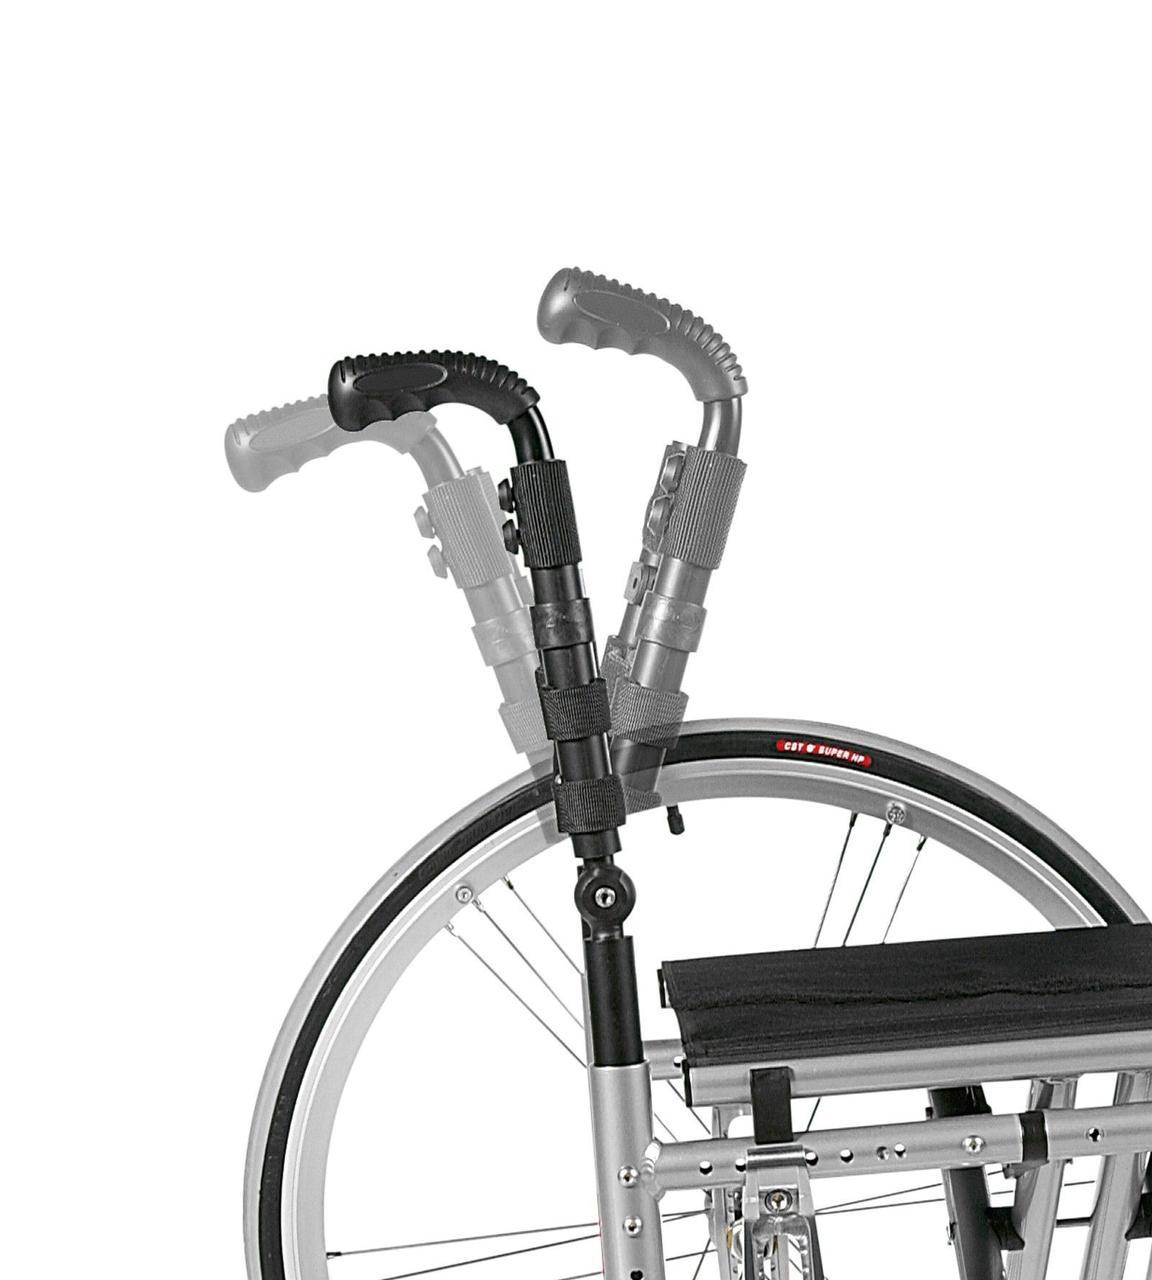 Кресло-коляска Otto Bock АВАНГАРД ТИН активного типа для детей и подростков - фото 10